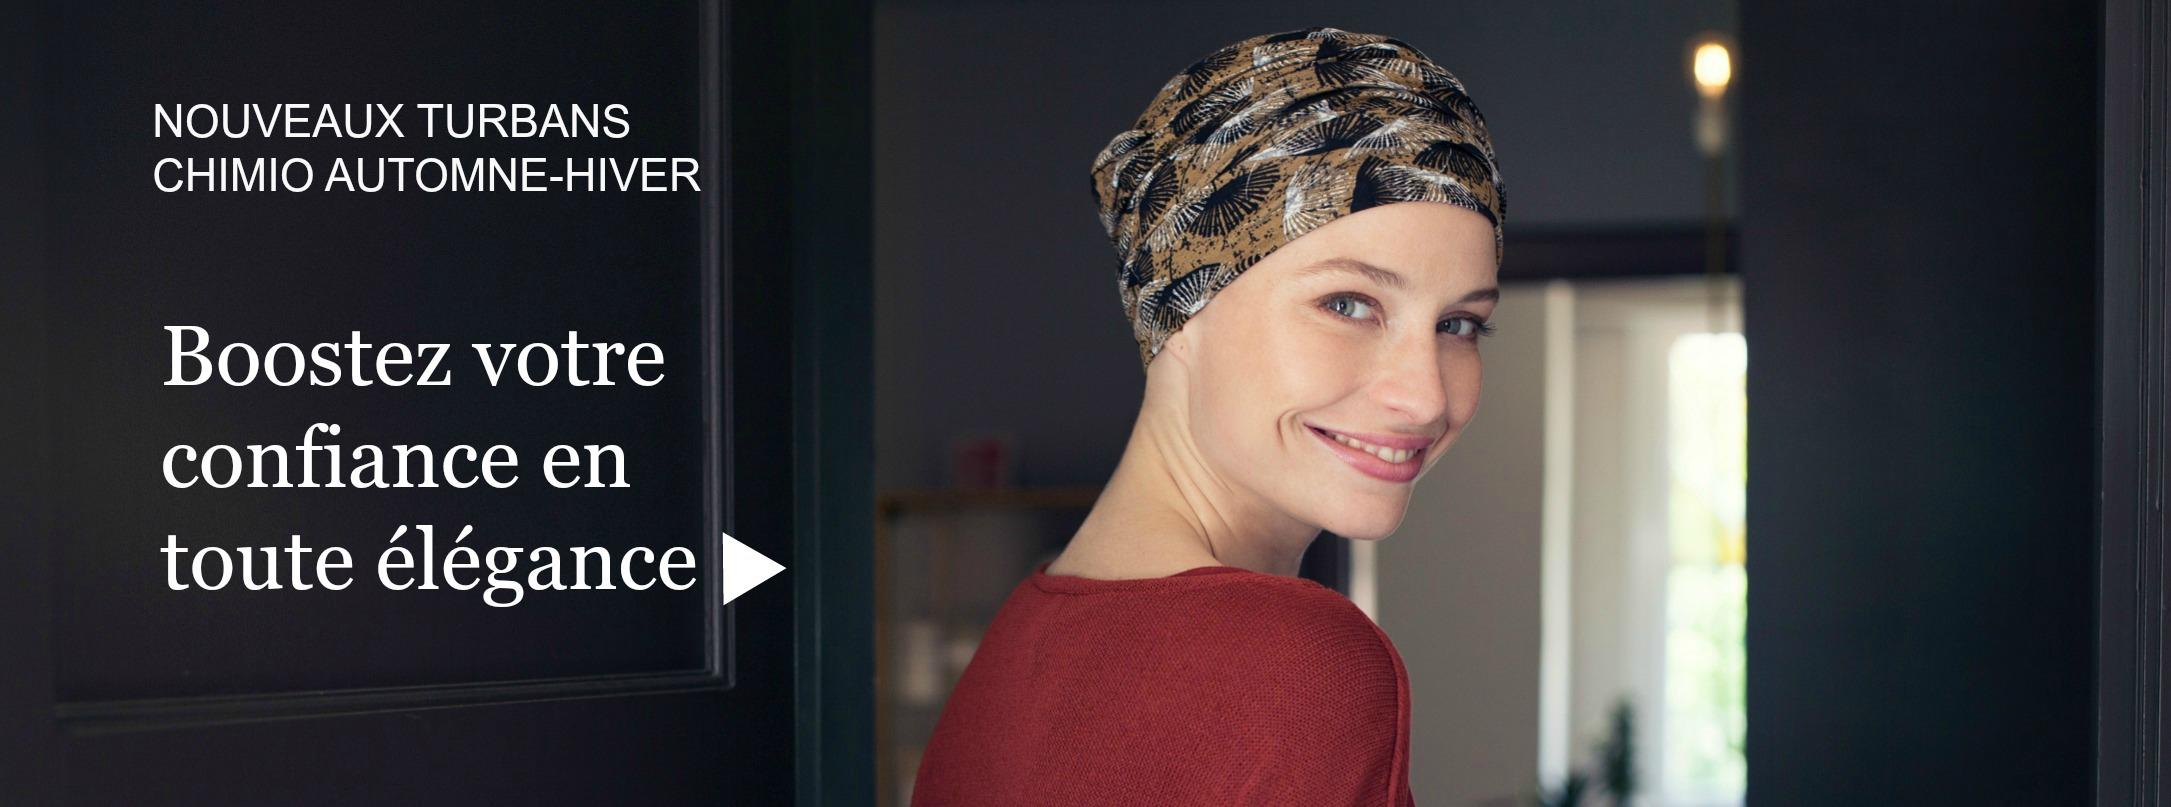 turbans chimio